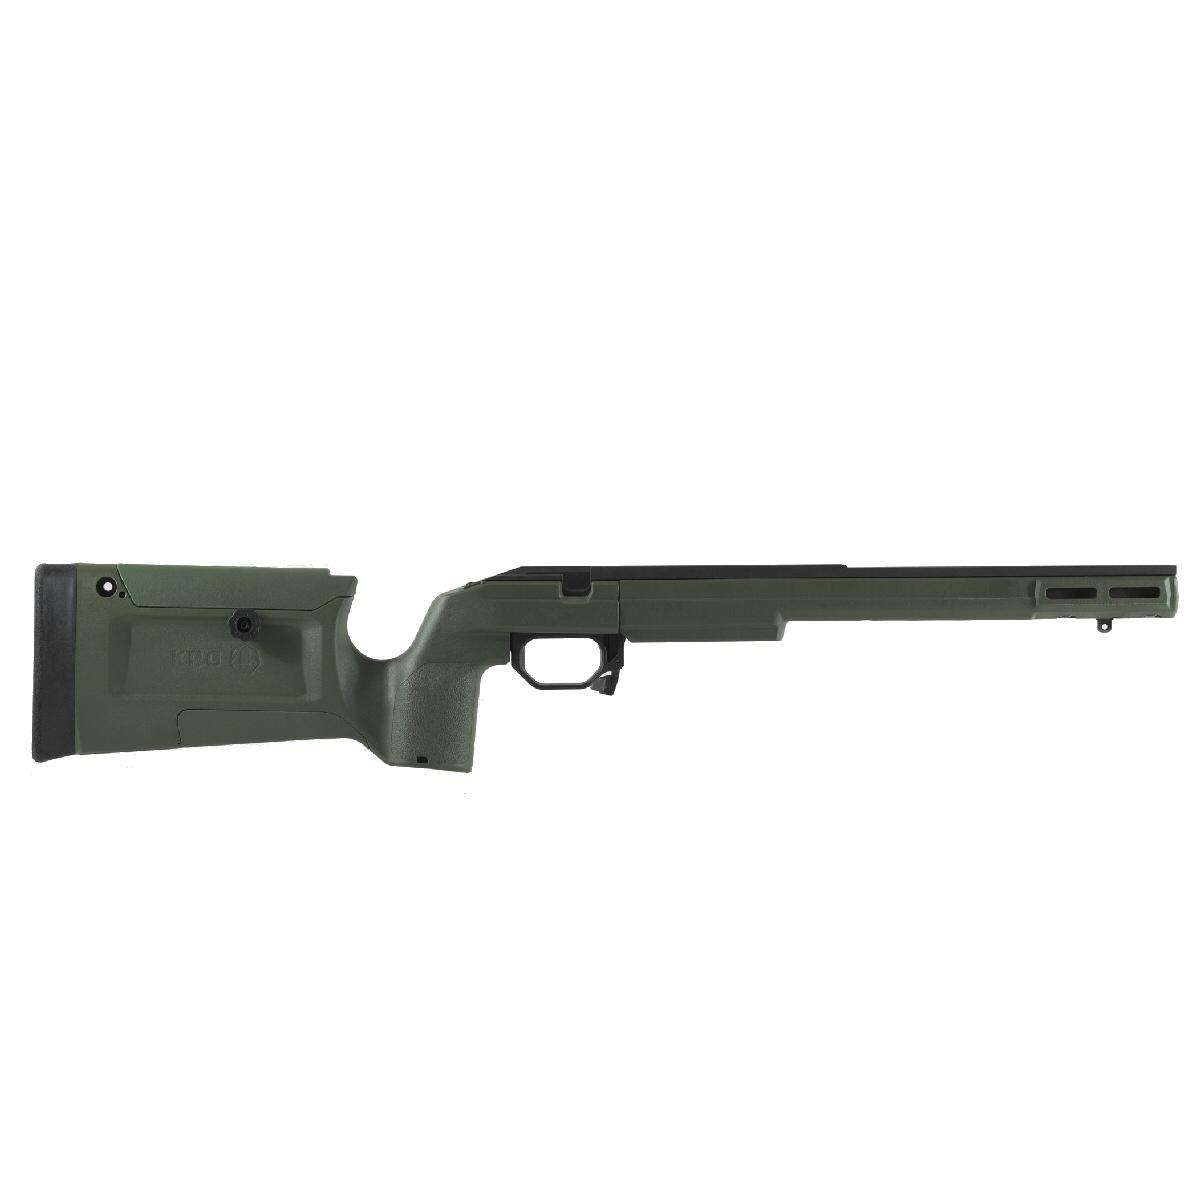 KRG Bravo Rifle Chassis Tikka T1X Rimfire Sako Green